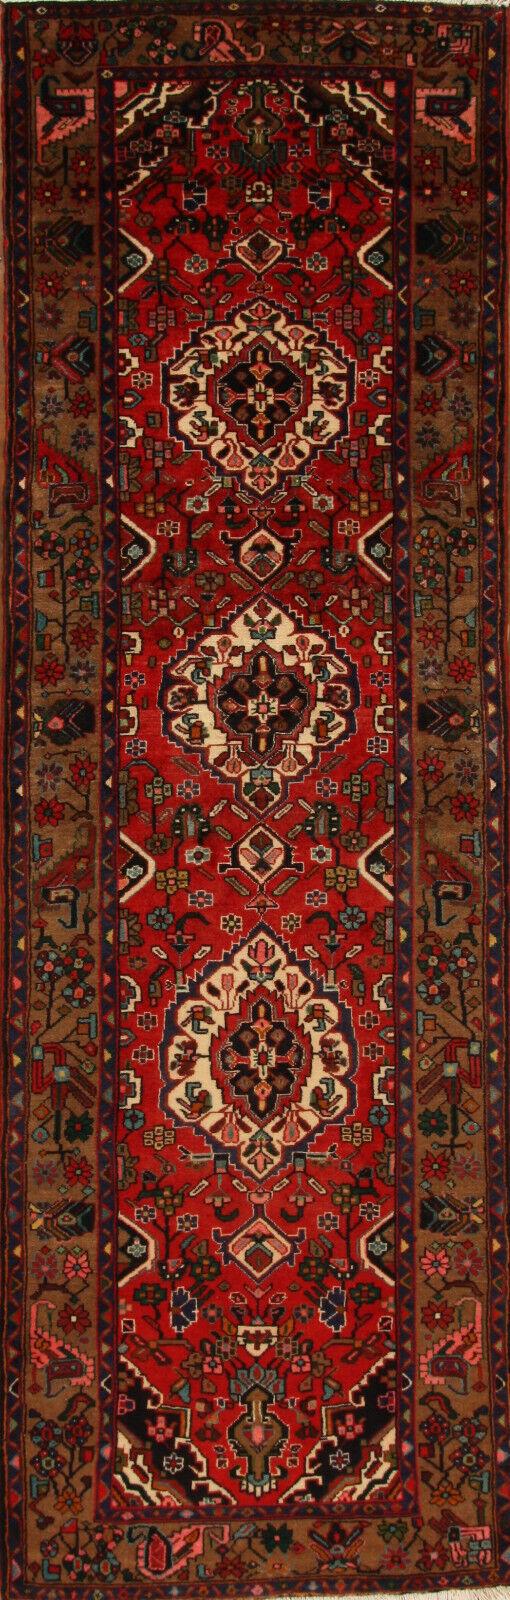 TAPPETO Orientale Vero Annodato Tapis persan n. 4617 (320 x 102) cm alfiere